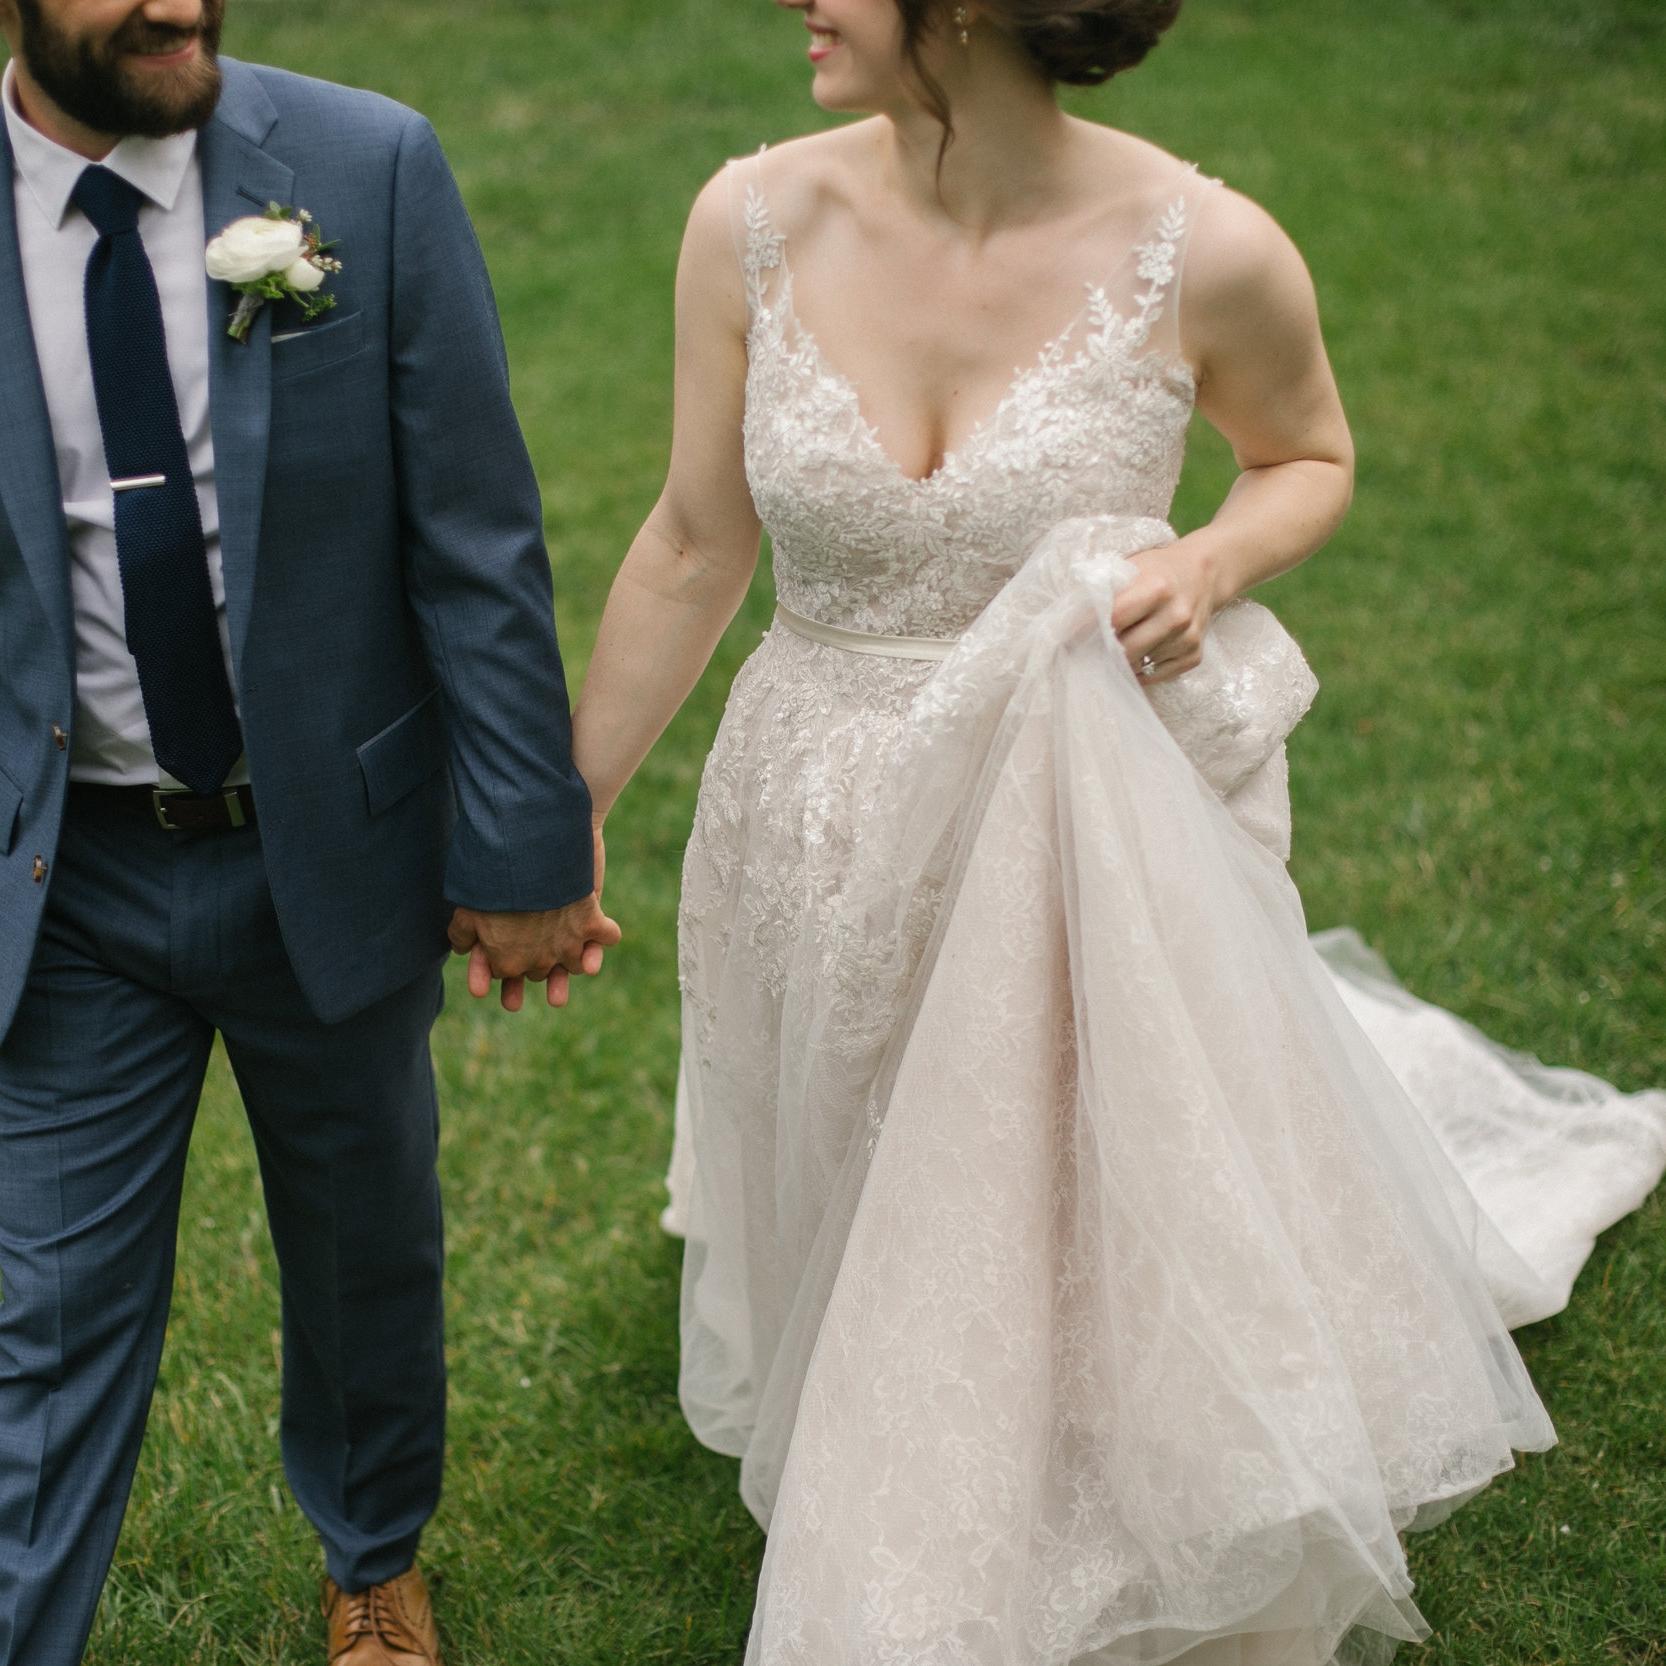 2018.06.23_ElizabethSam_Wedding_Starks-0022.jpg